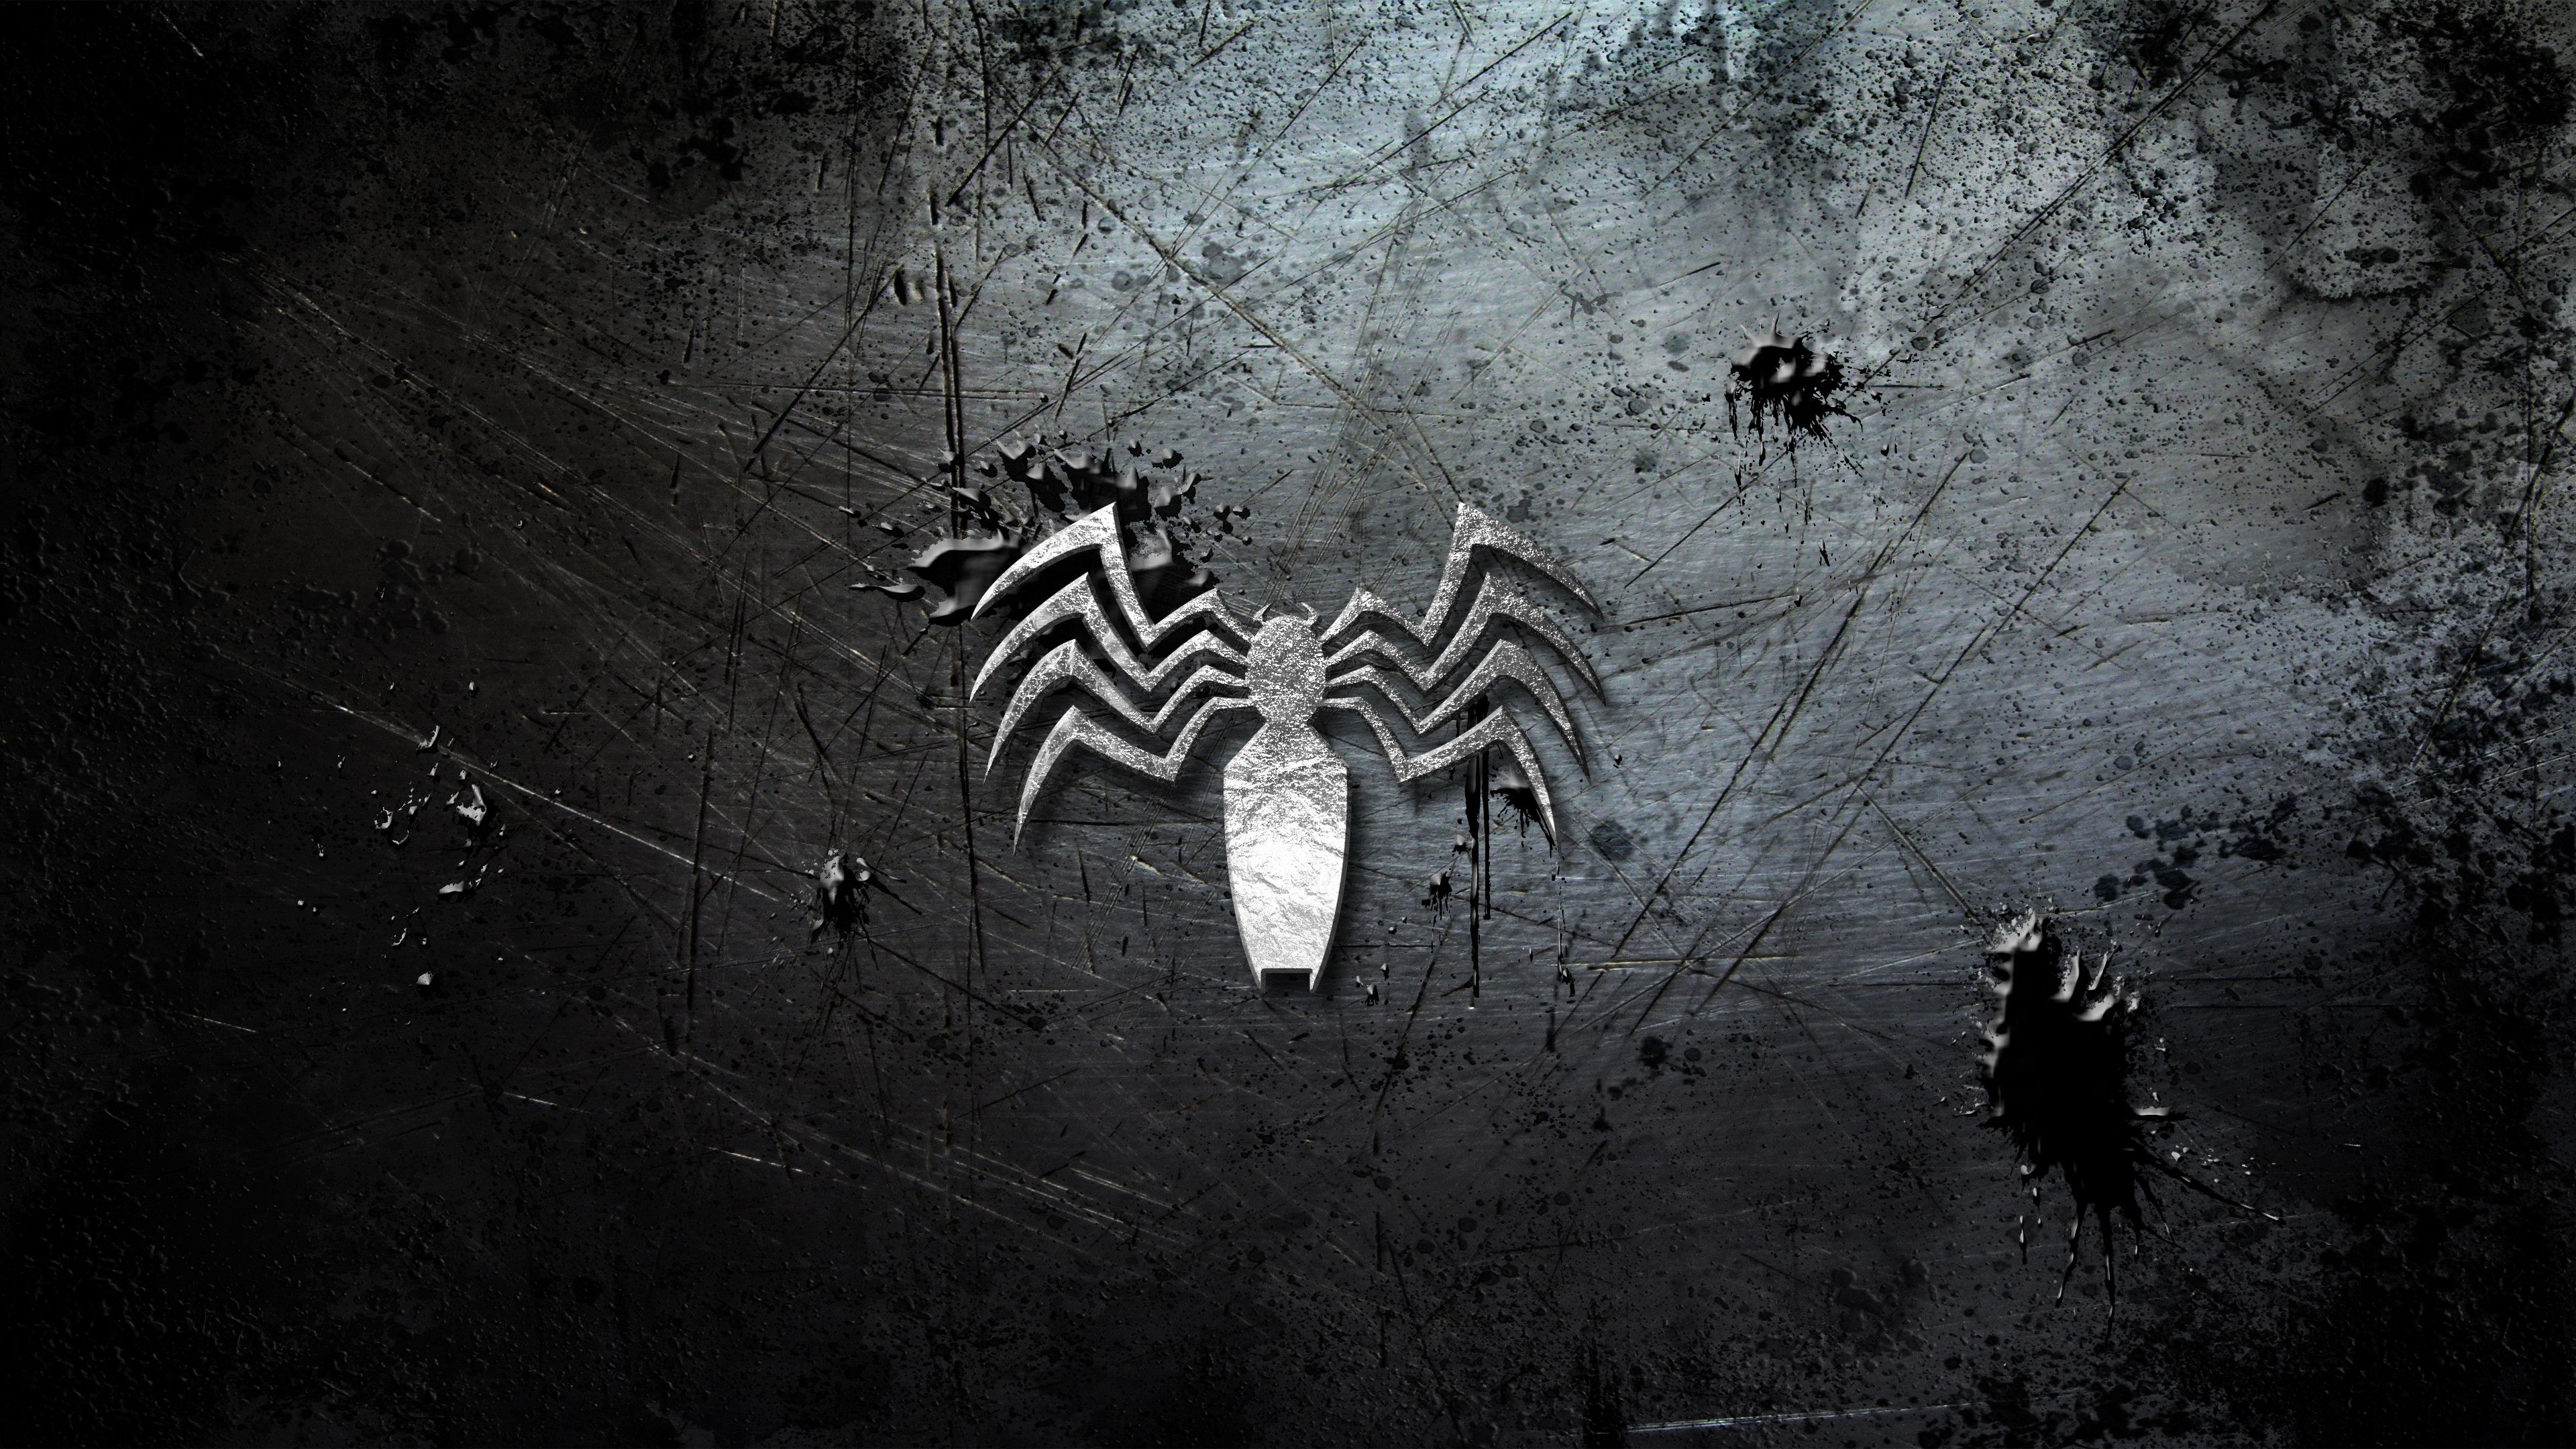 venom wallpaper 1920x1080, venom 4k wallpaper for pc